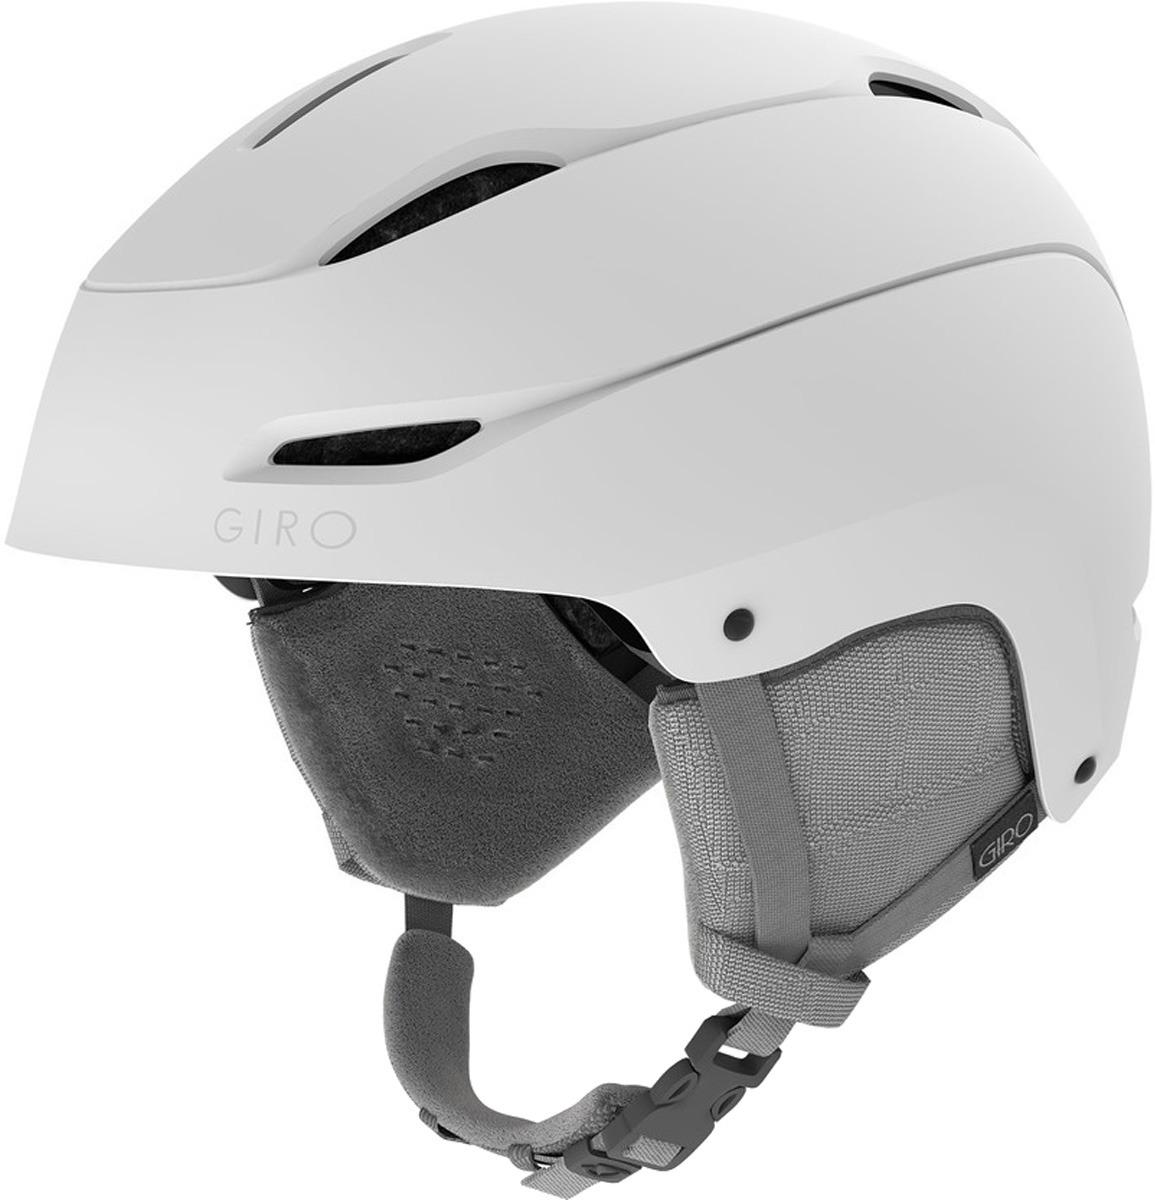 Шлем горнолыжный Giro Ceva женский, 7094004, белый, размер S (52-55) цена 2017